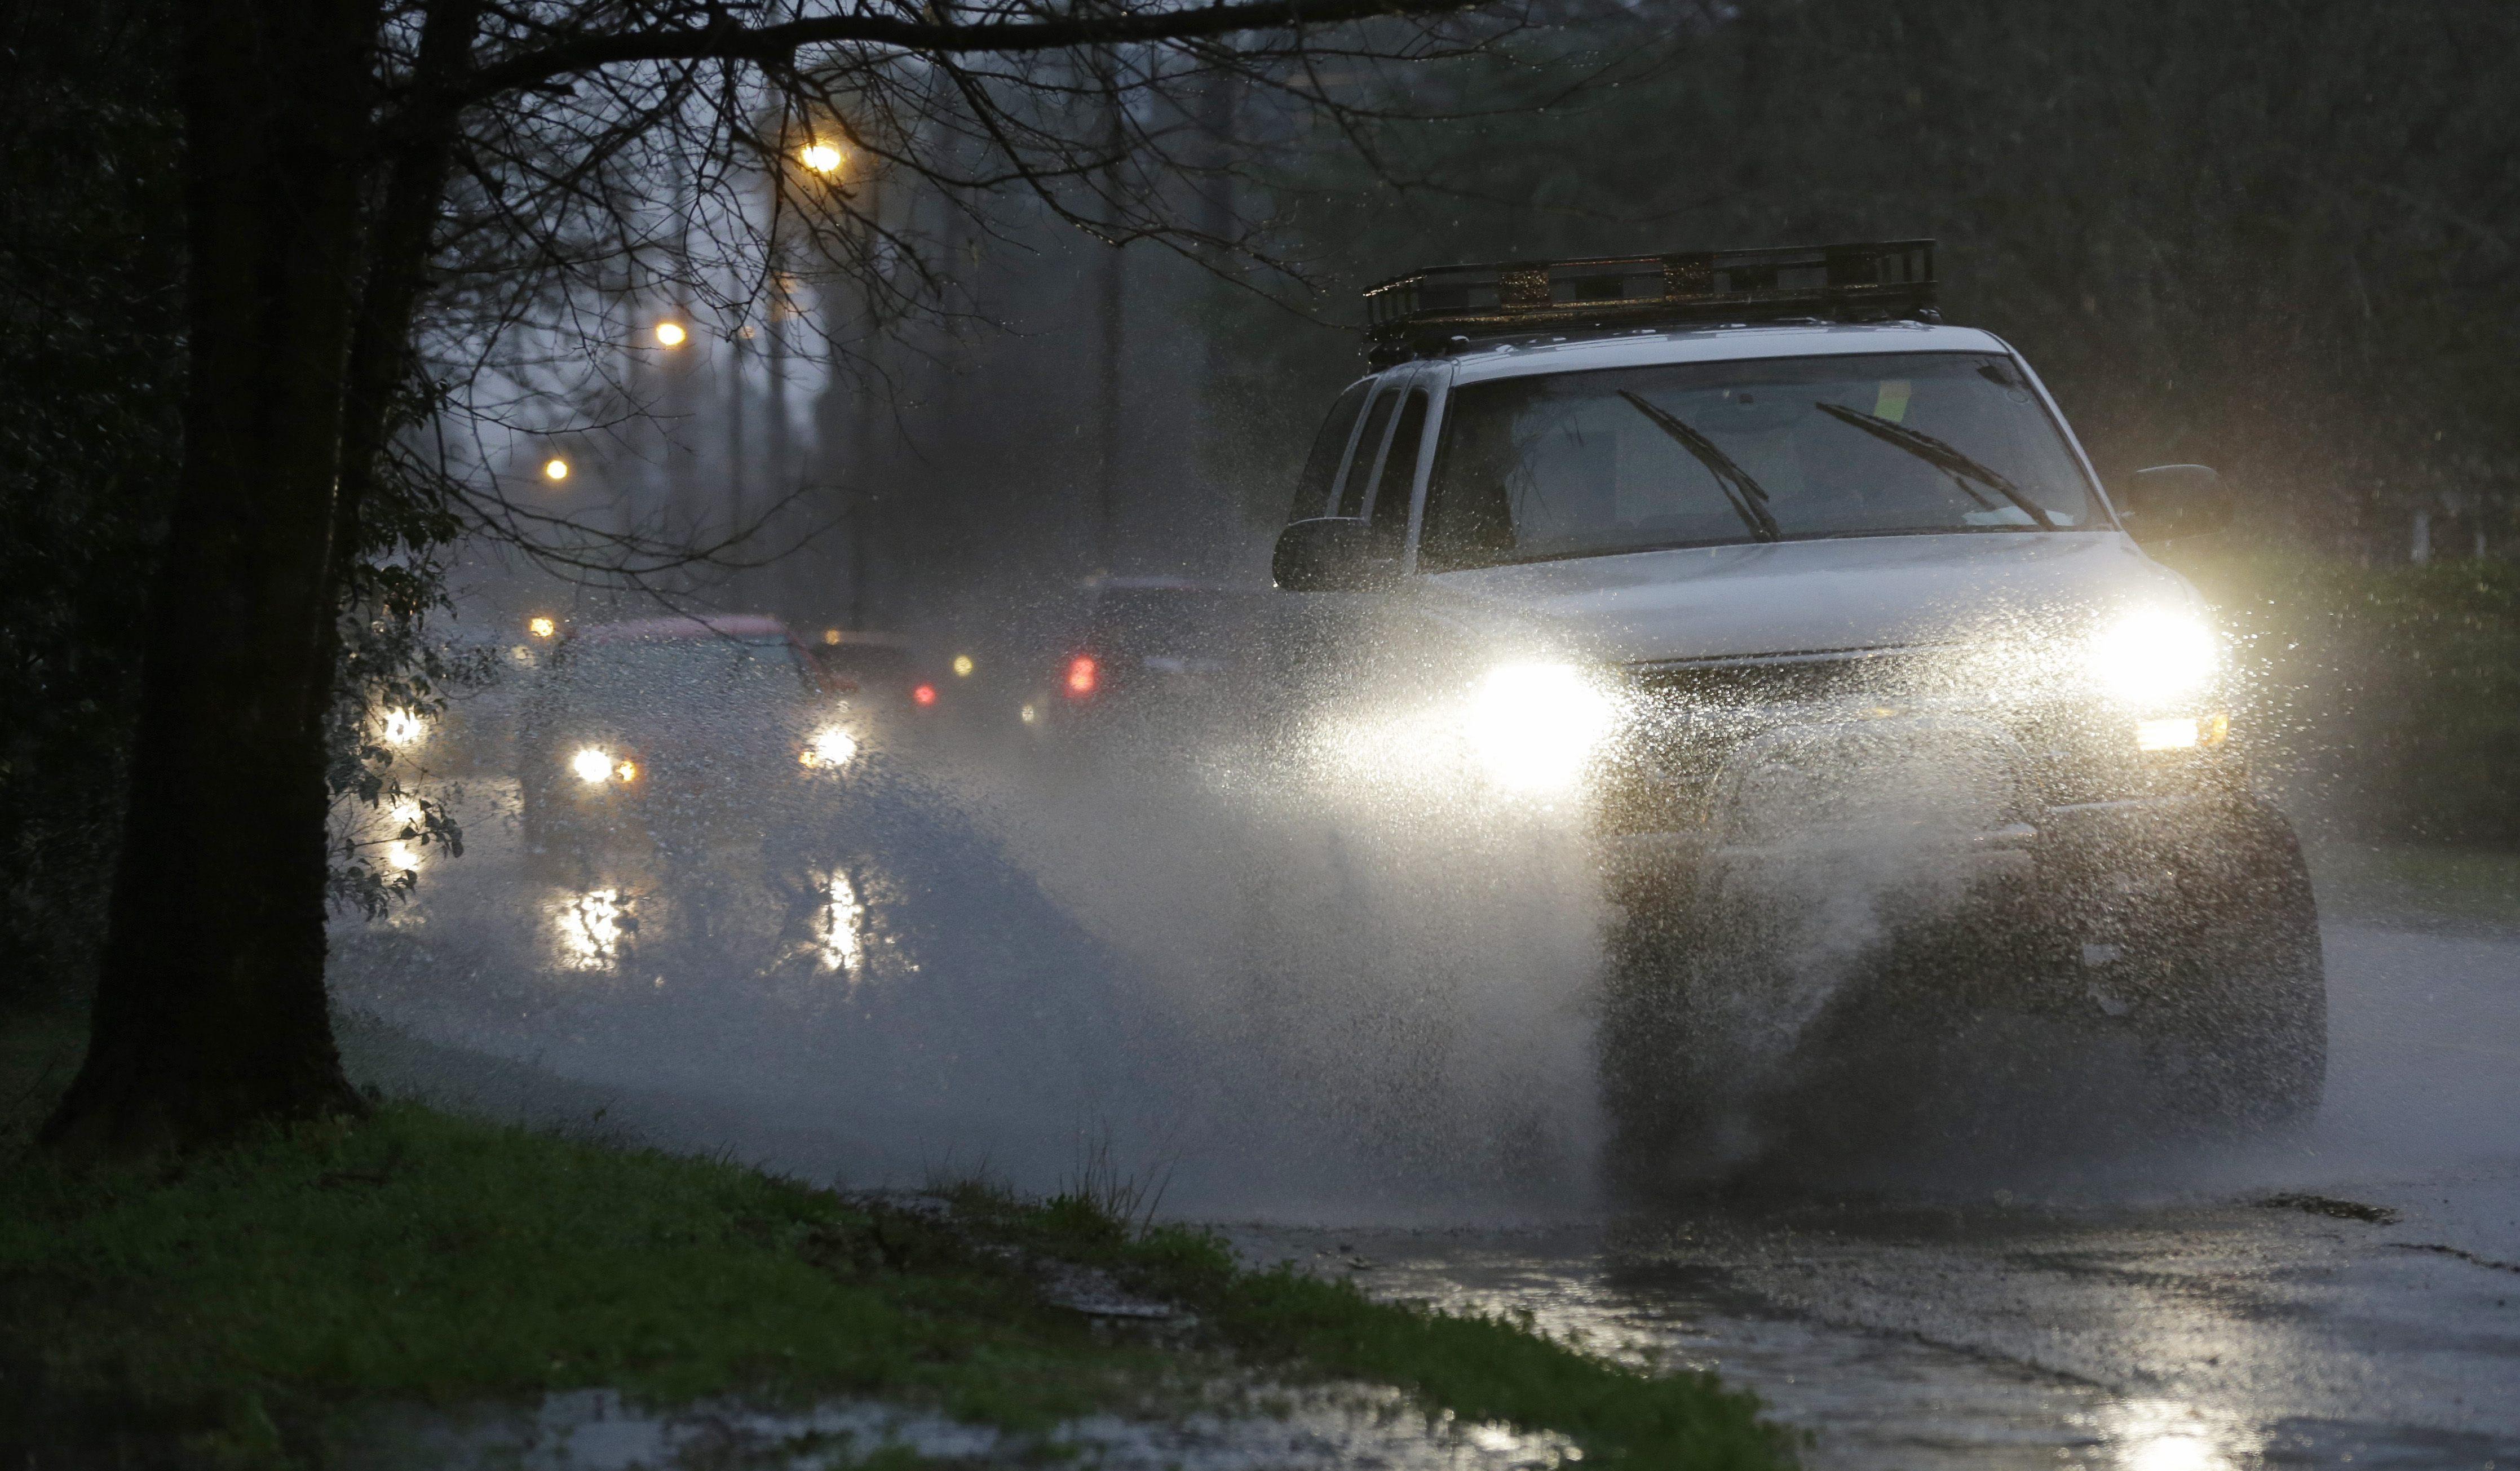 Rush hour traffic drives through minor street flooding in Montgomery, Ala., Tuesday, Feb. 12, 2013.